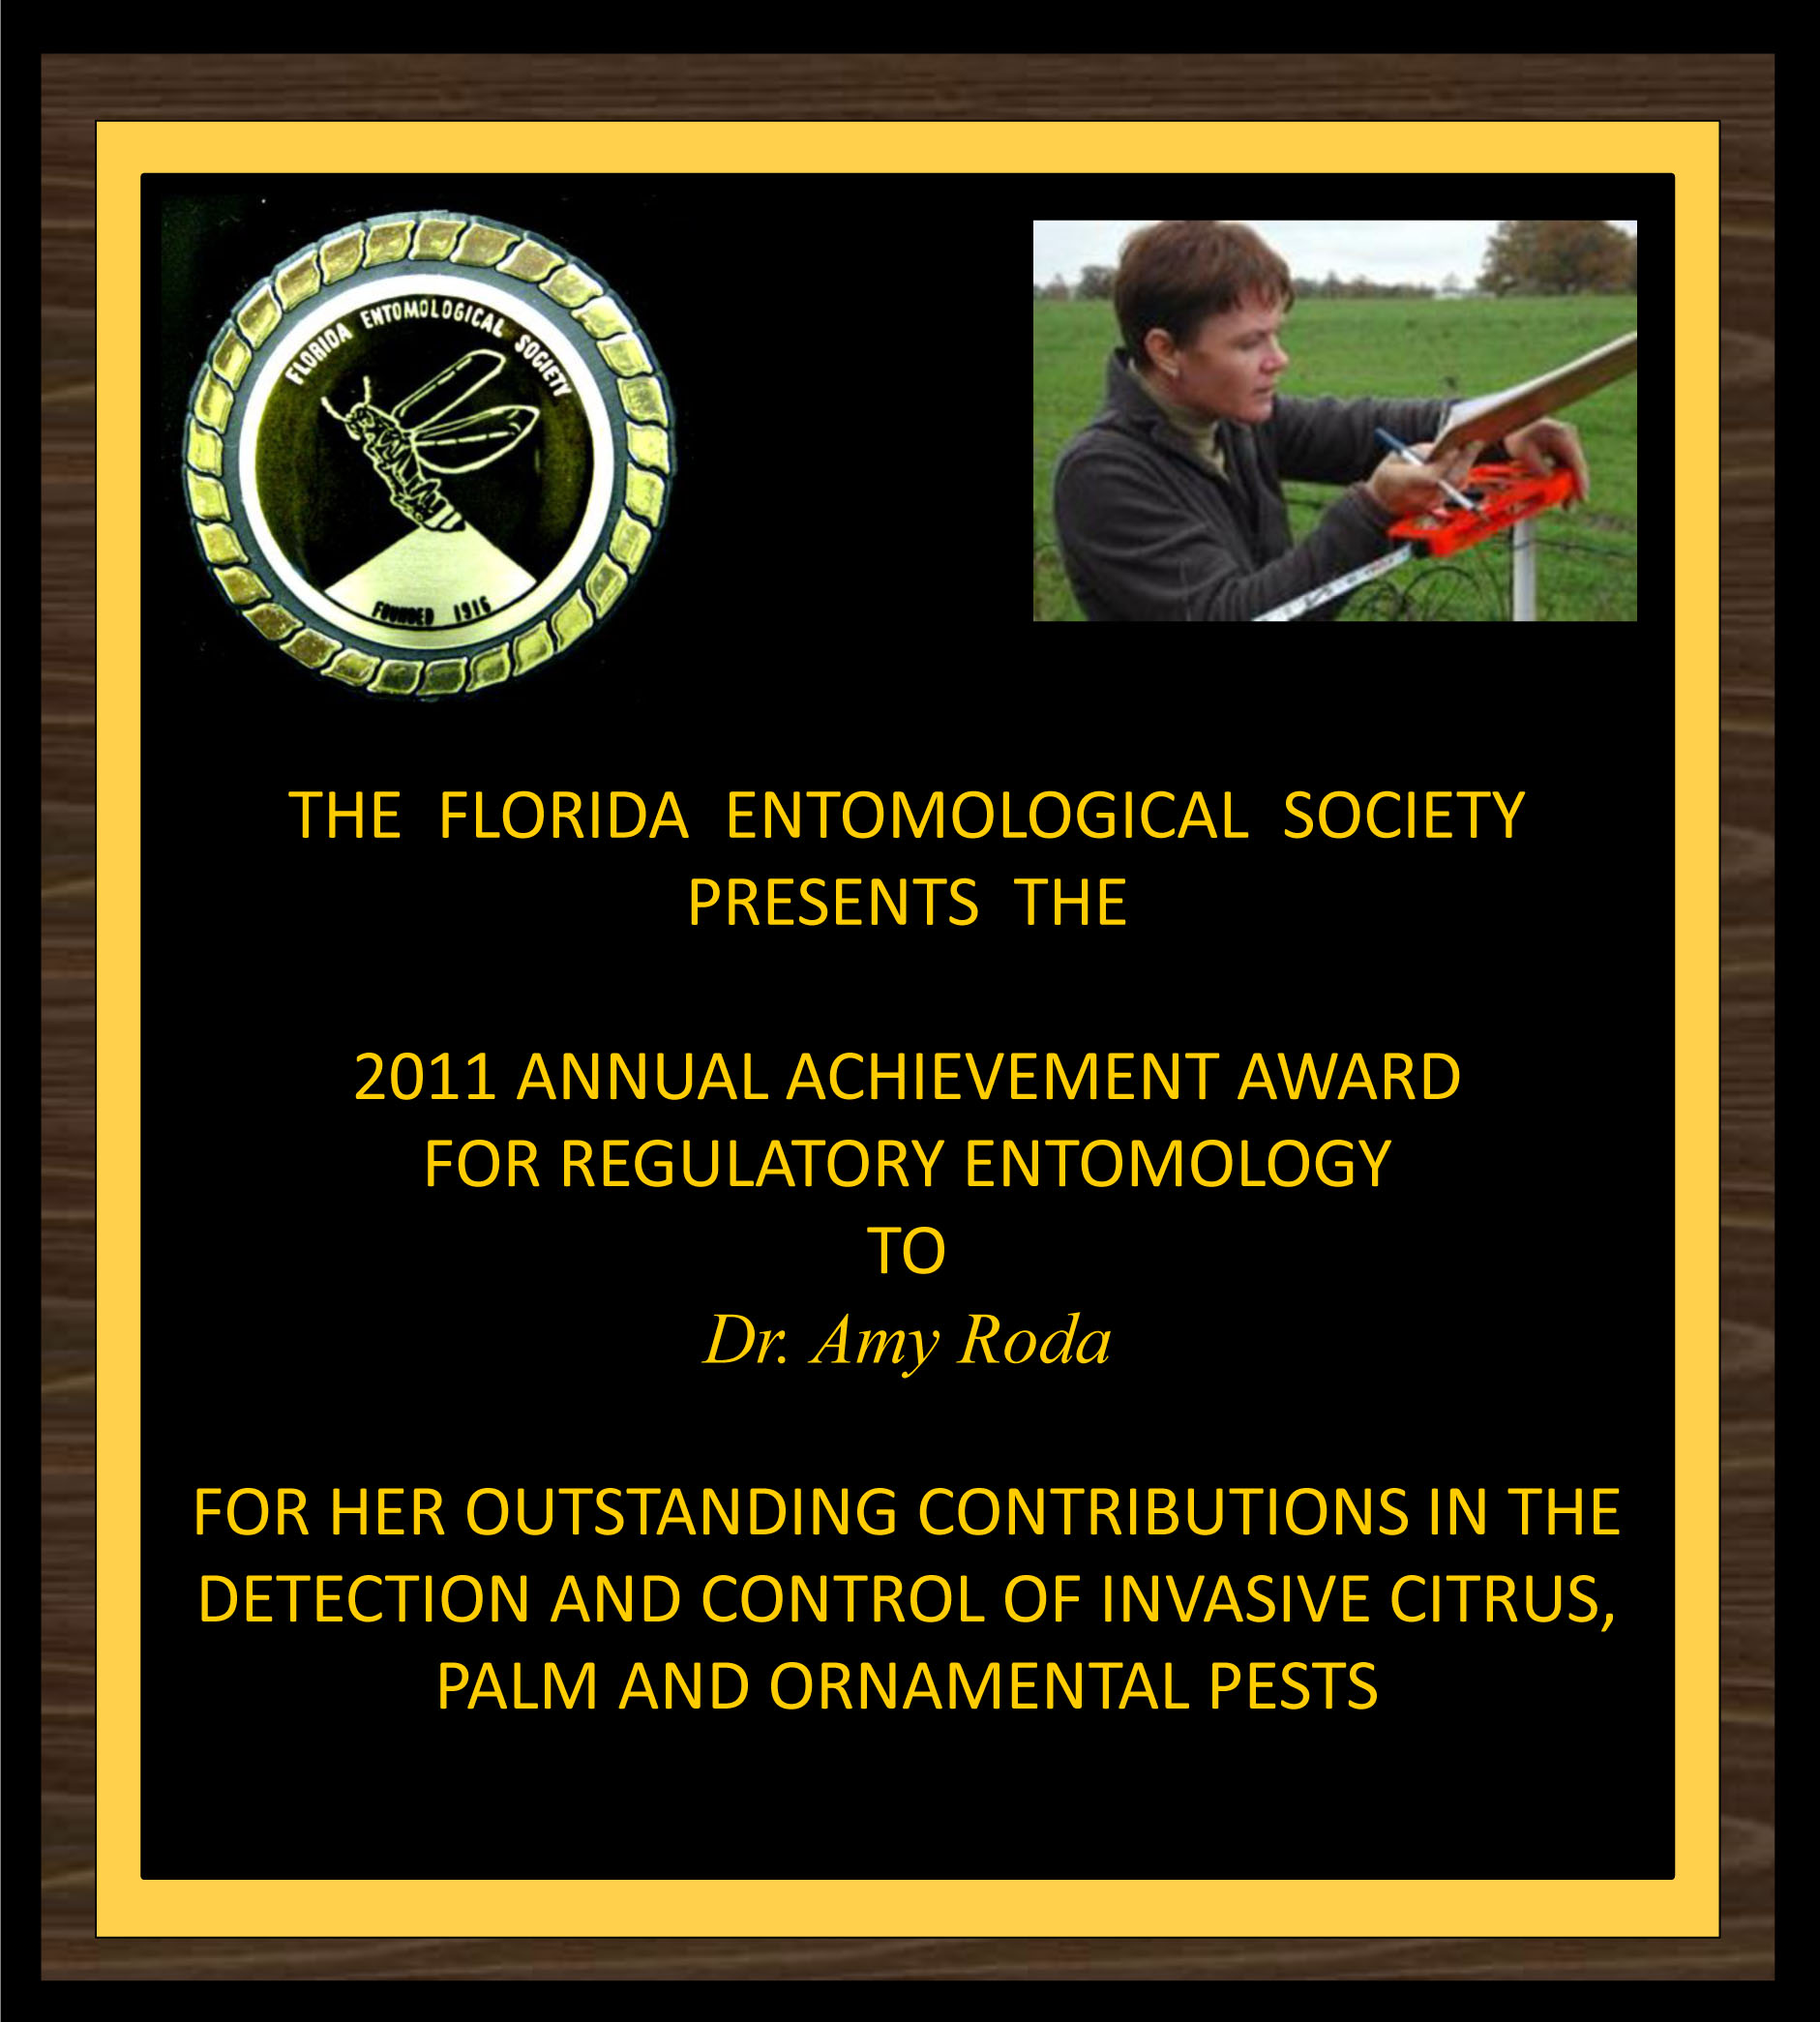 Amy Roda receives 2011 FES Achievement Award for Regulatory Entomology